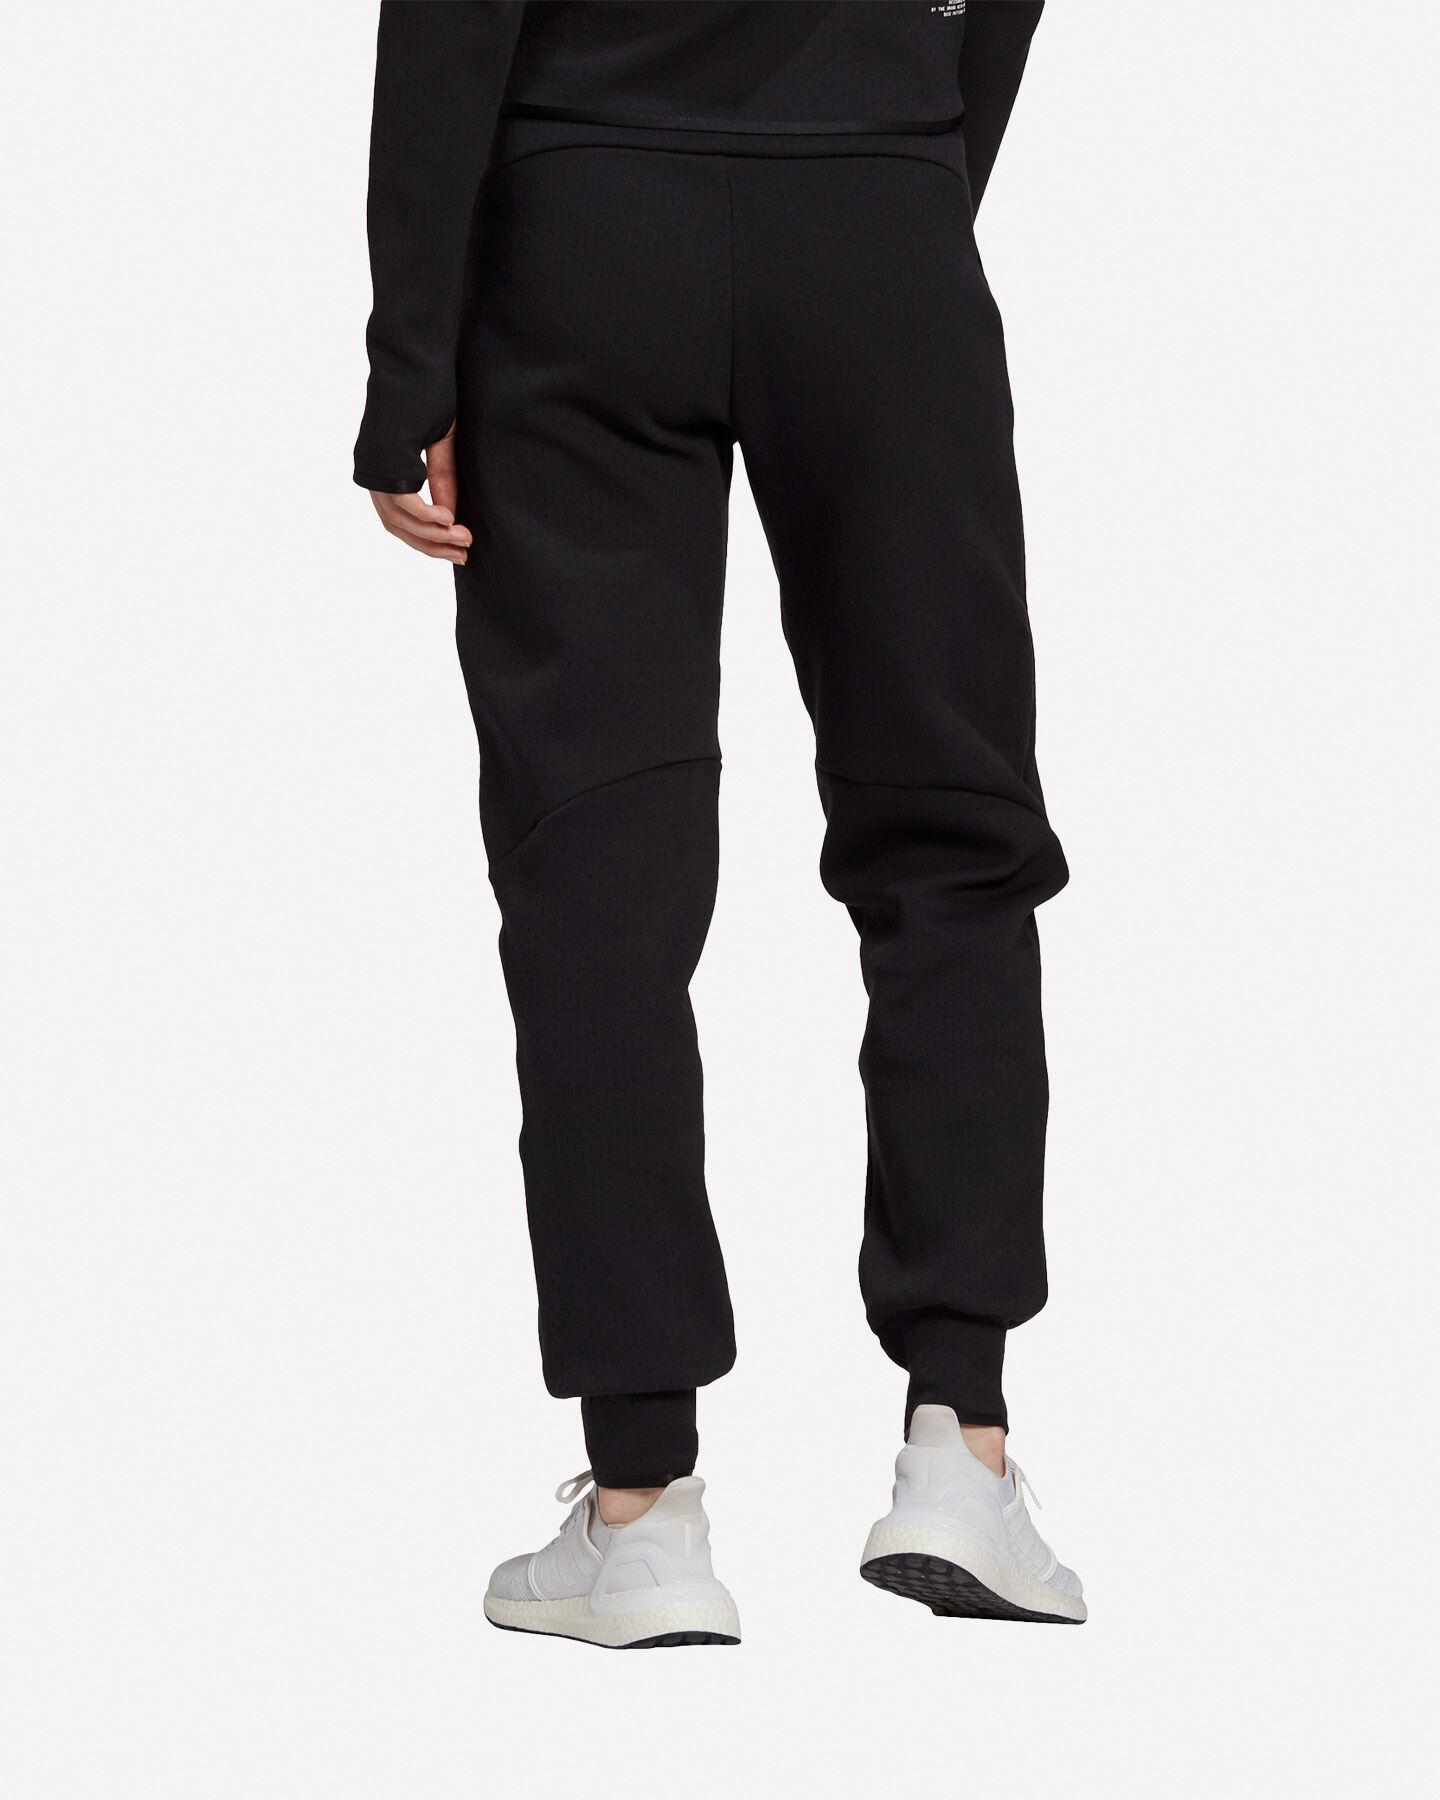 Pantalone ADIDAS ZONE  W S5228086 scatto 4